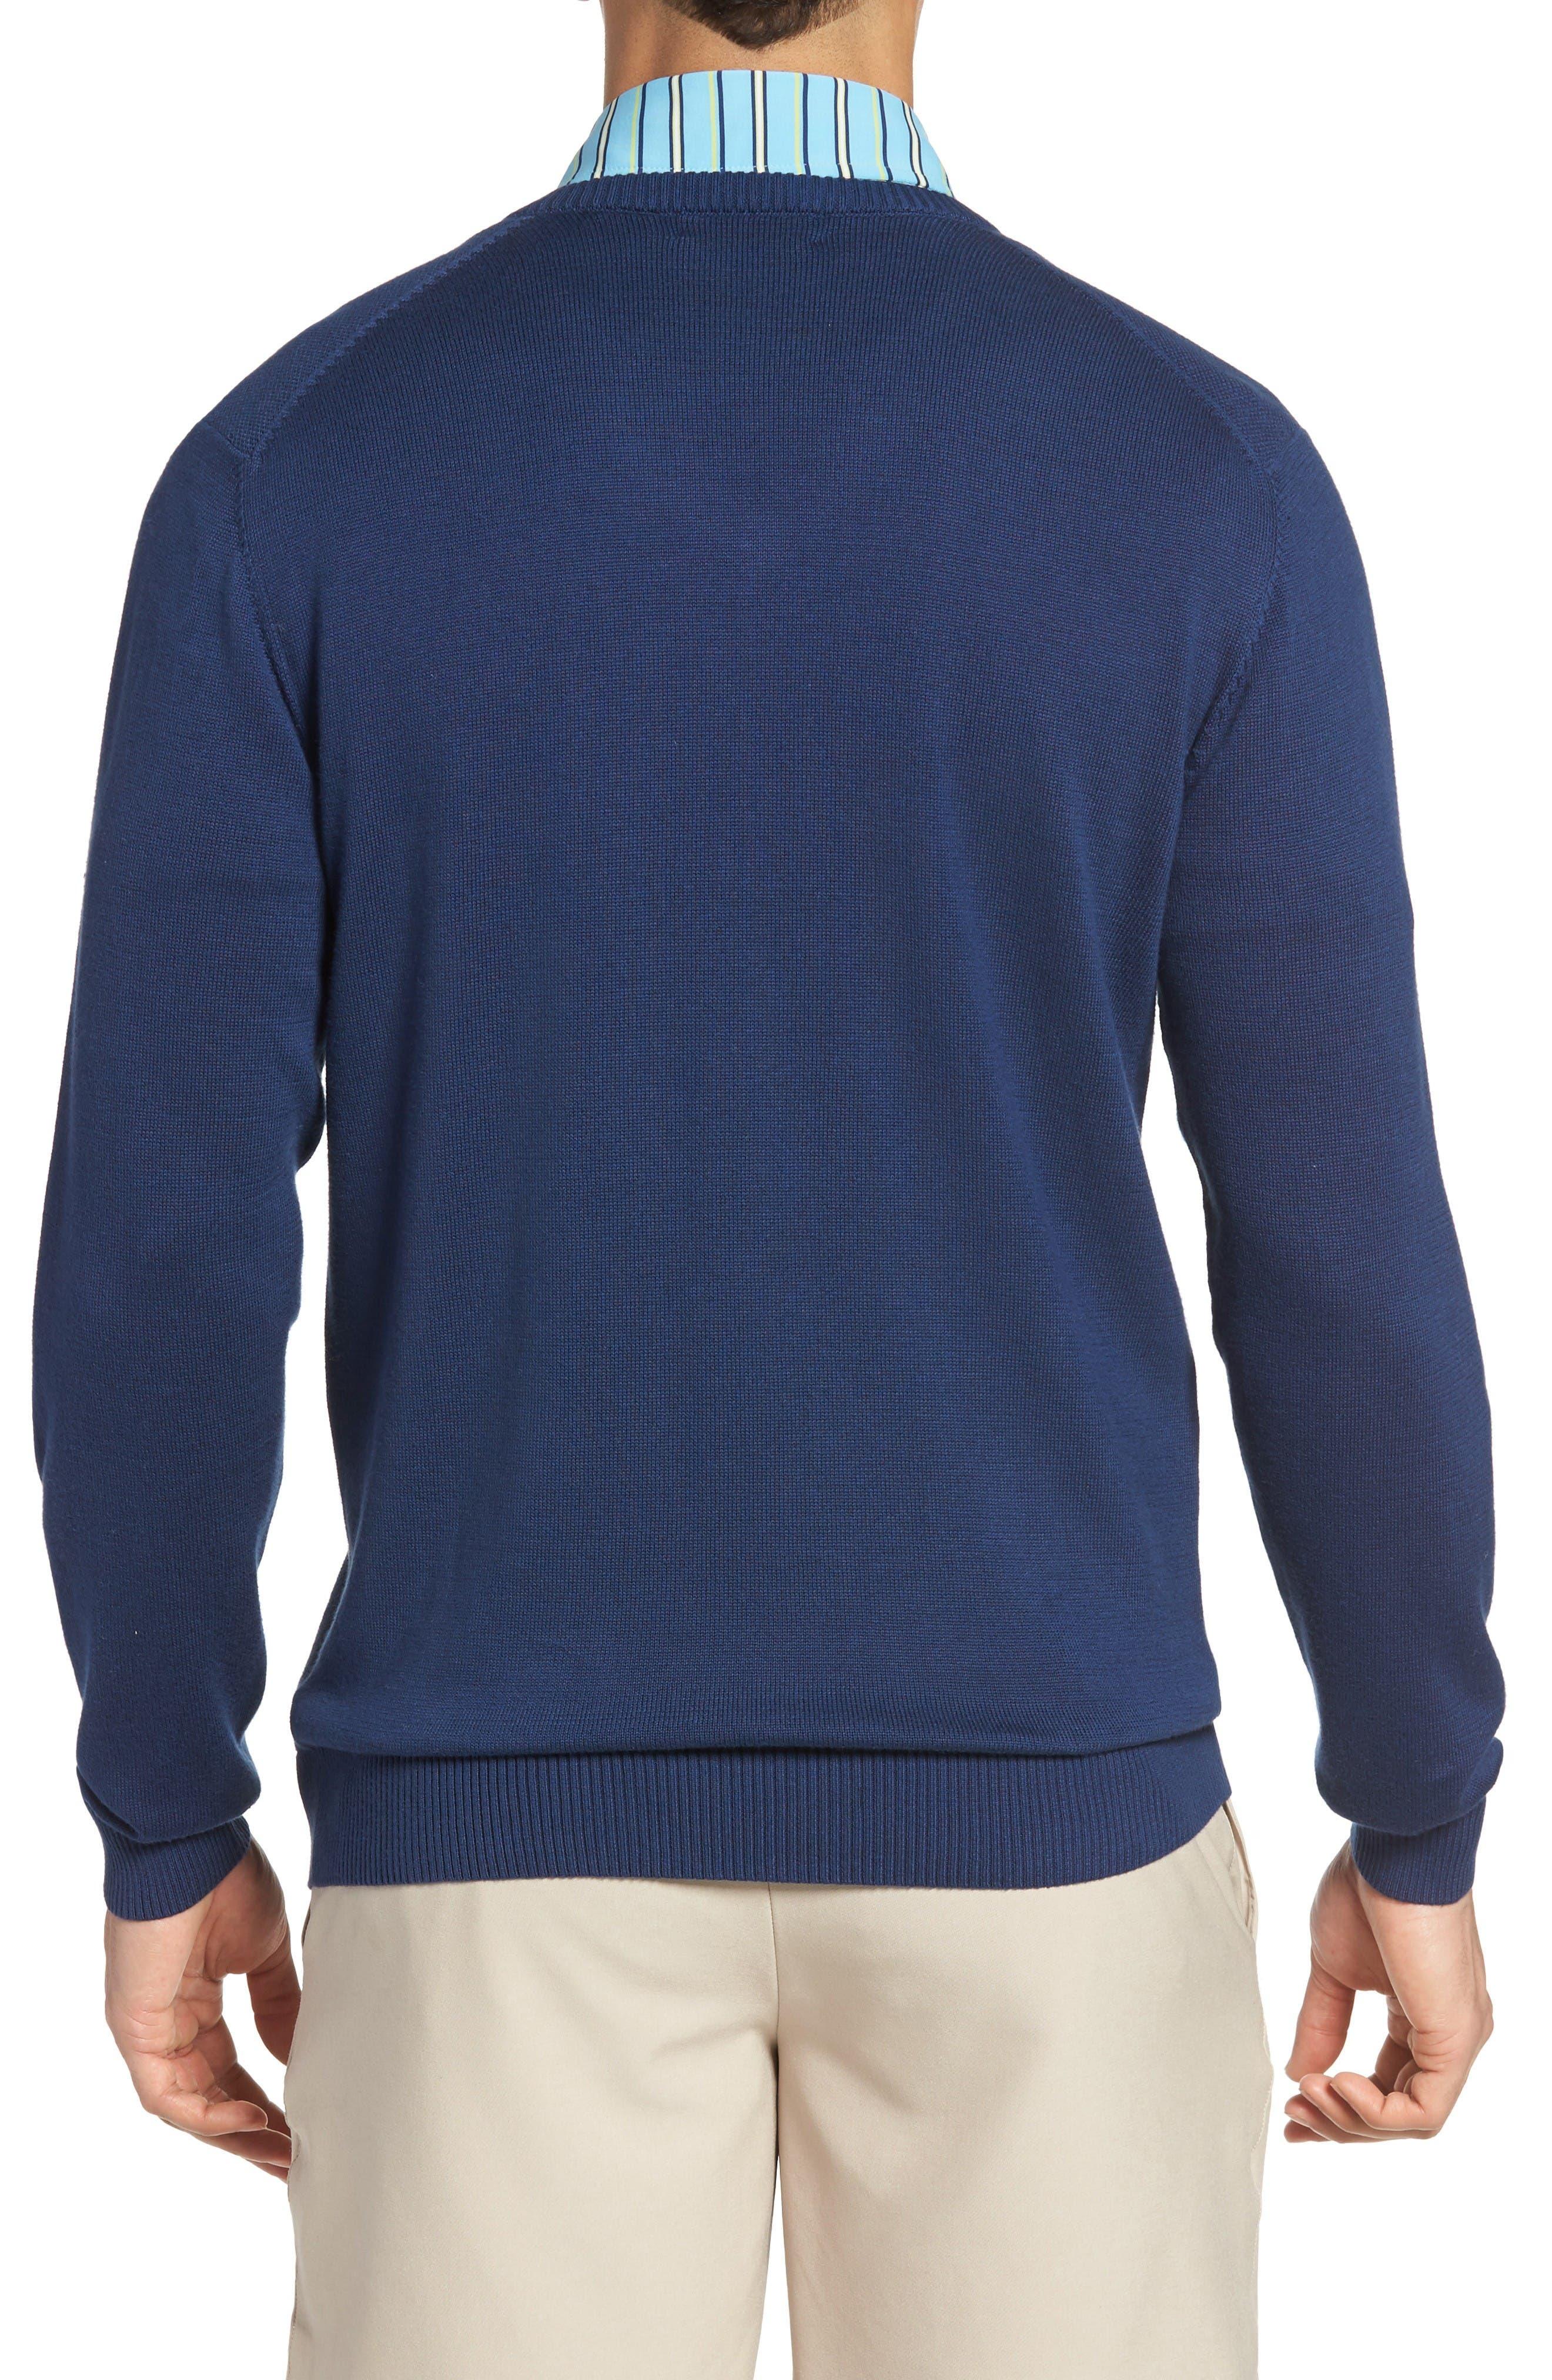 Piqué Jersey V-Neck Sweater,                             Alternate thumbnail 2, color,                             Summer Navy